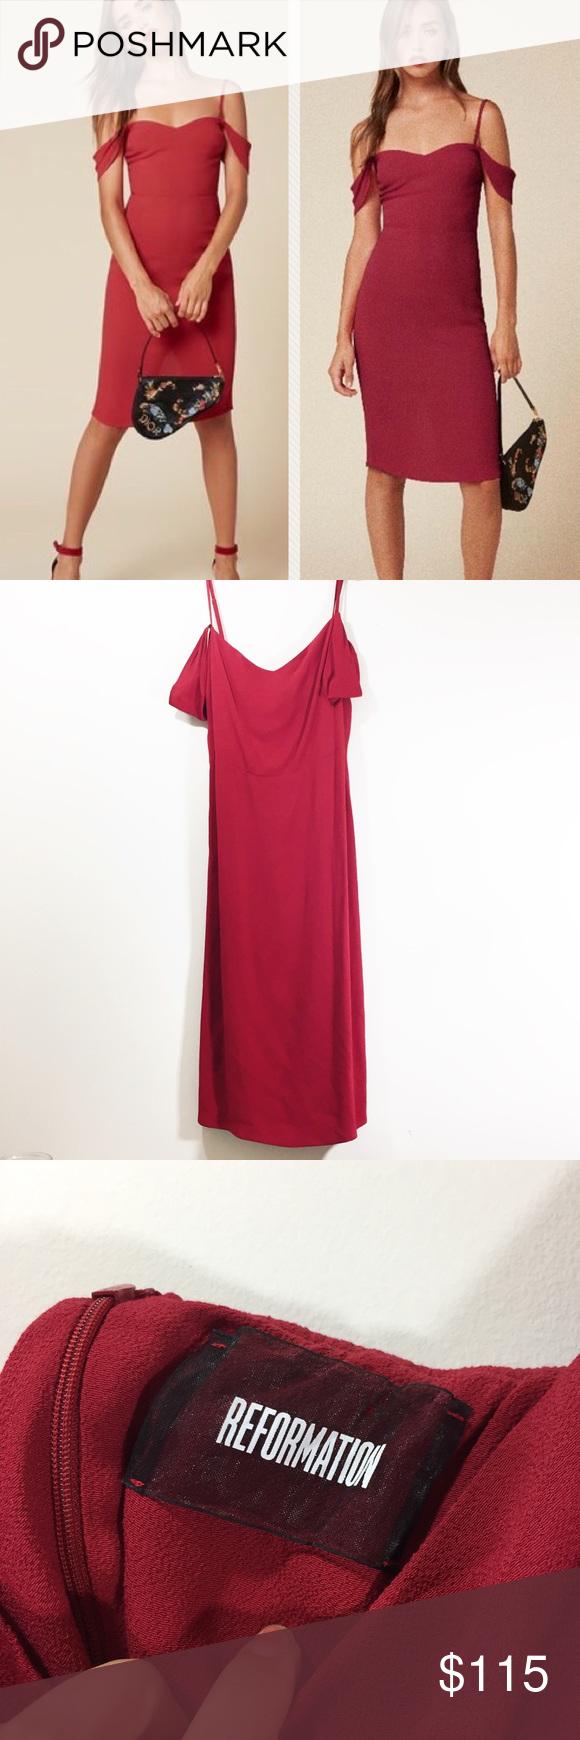 Reformation Rena Dress | Clothes design, Dresses